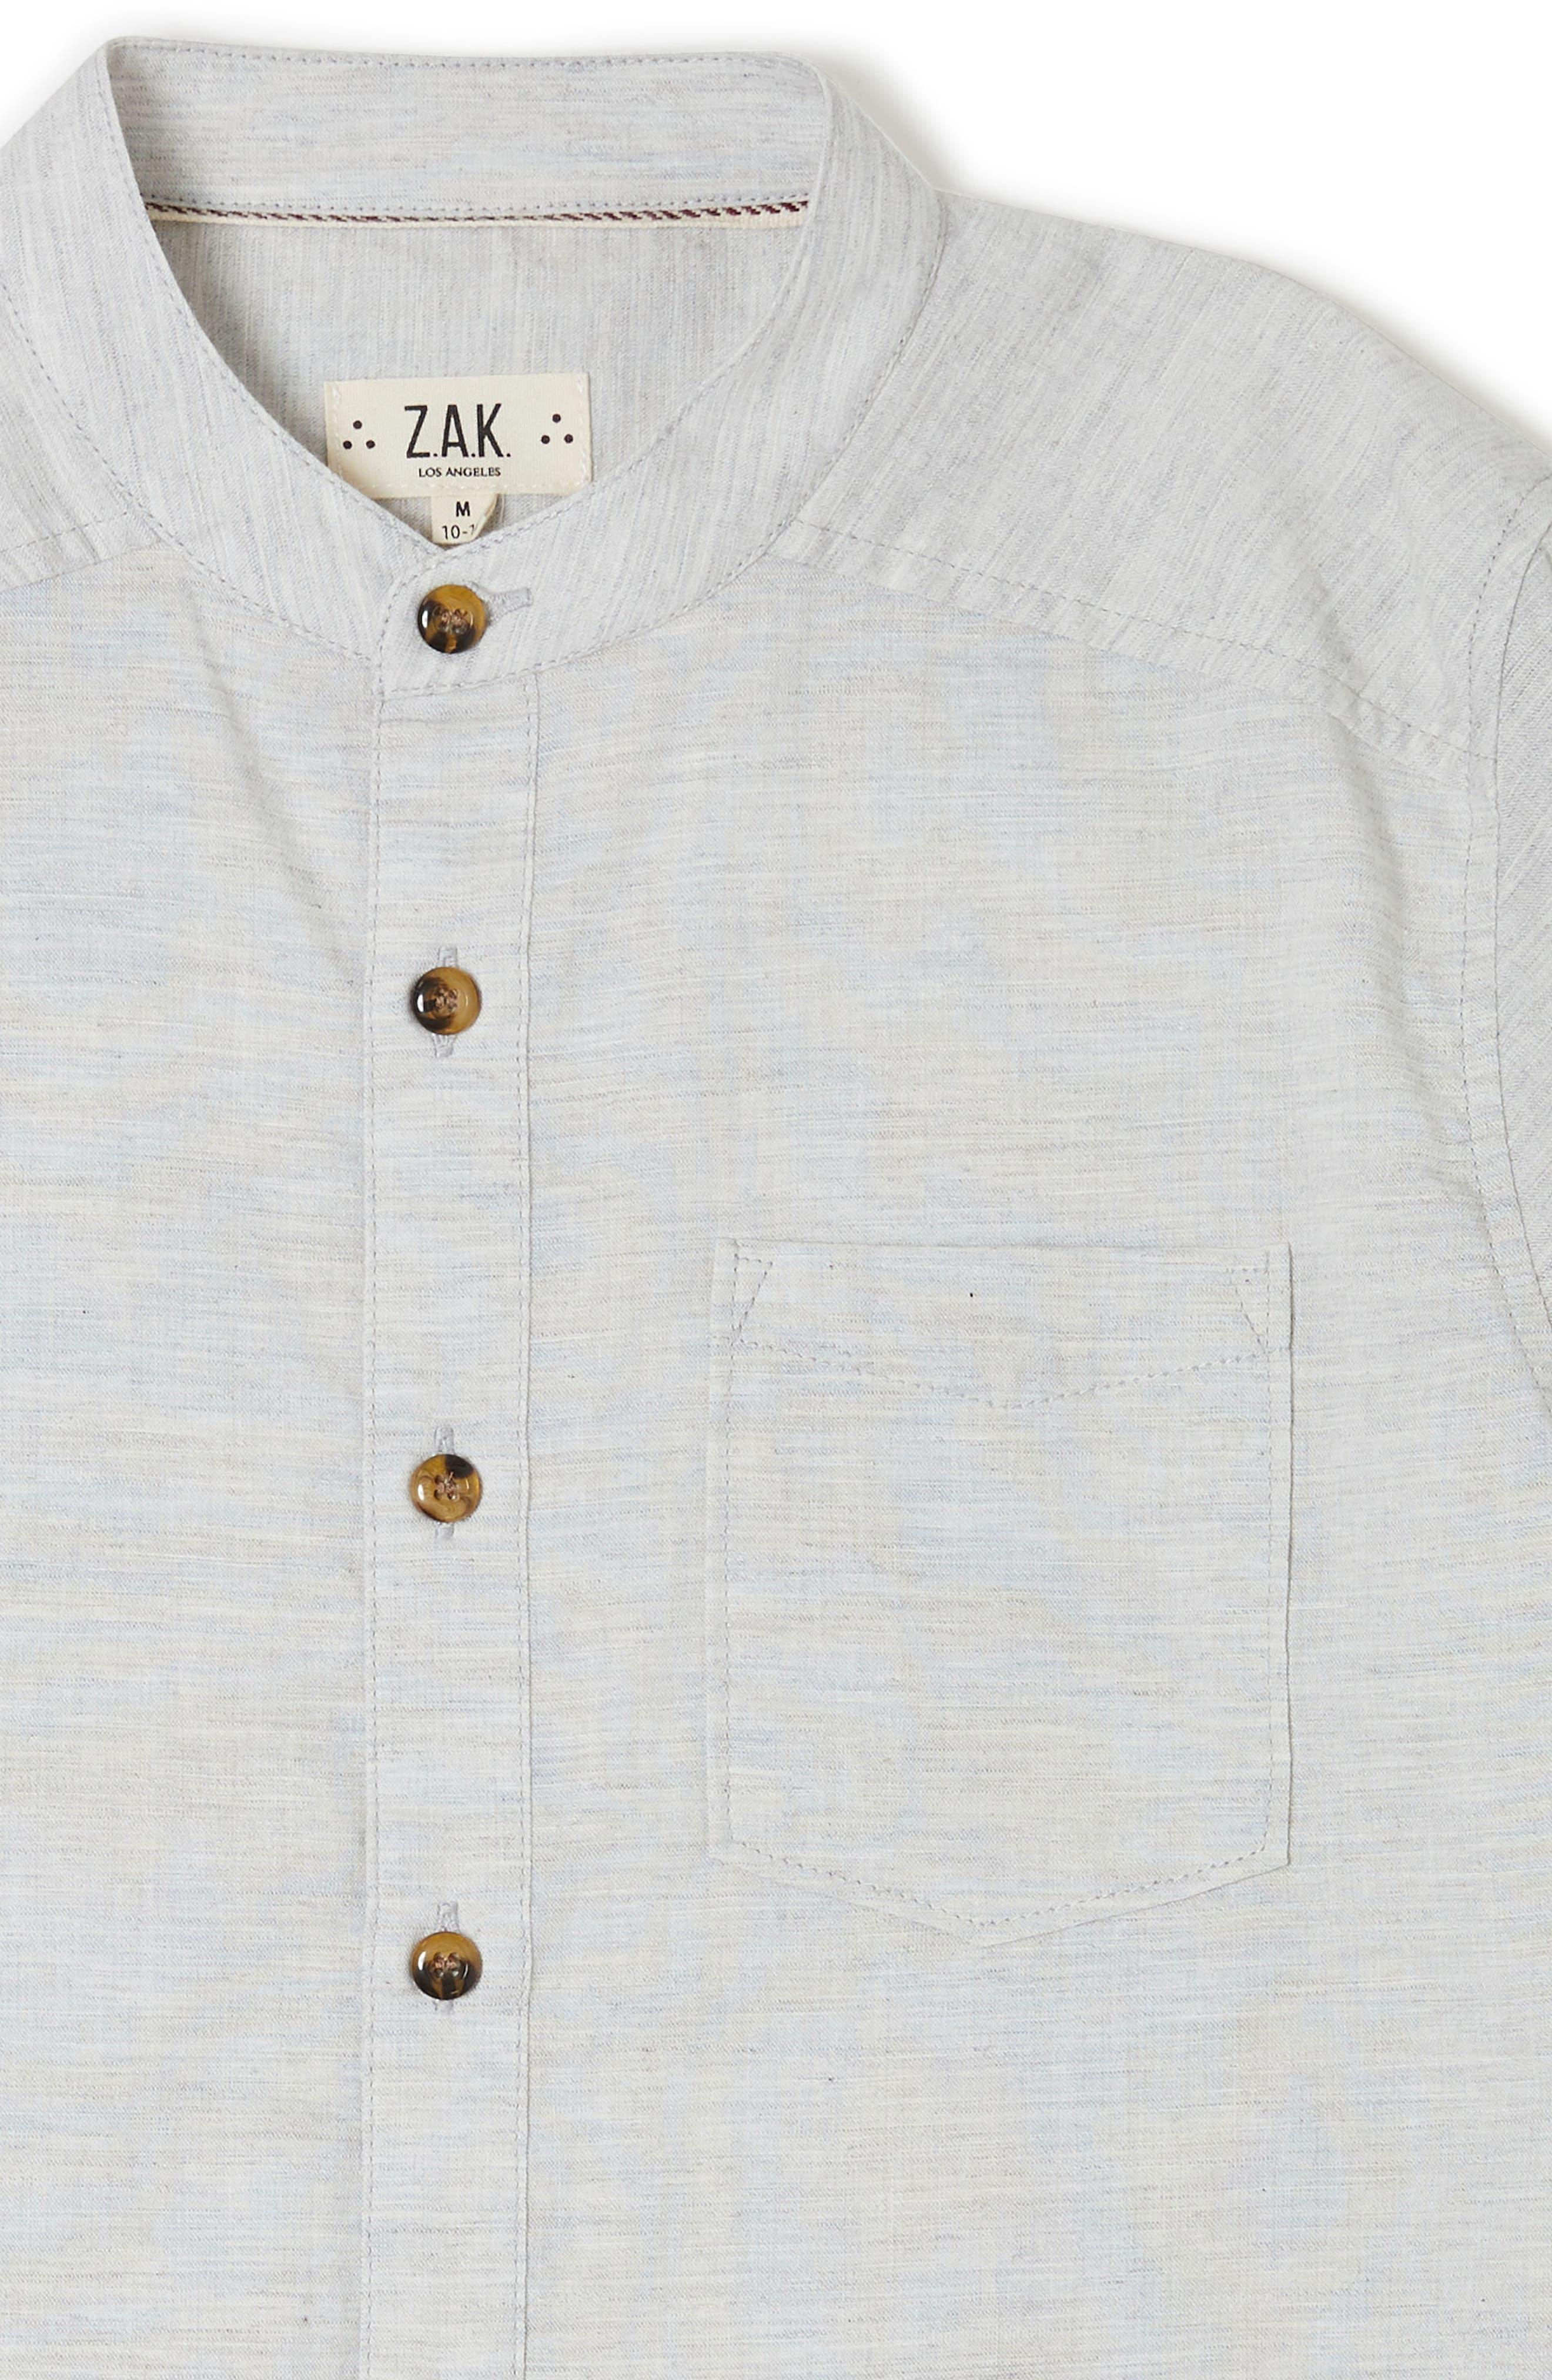 Rancho Long Sleeve Shirt,                             Alternate thumbnail 2, color,                             Grey